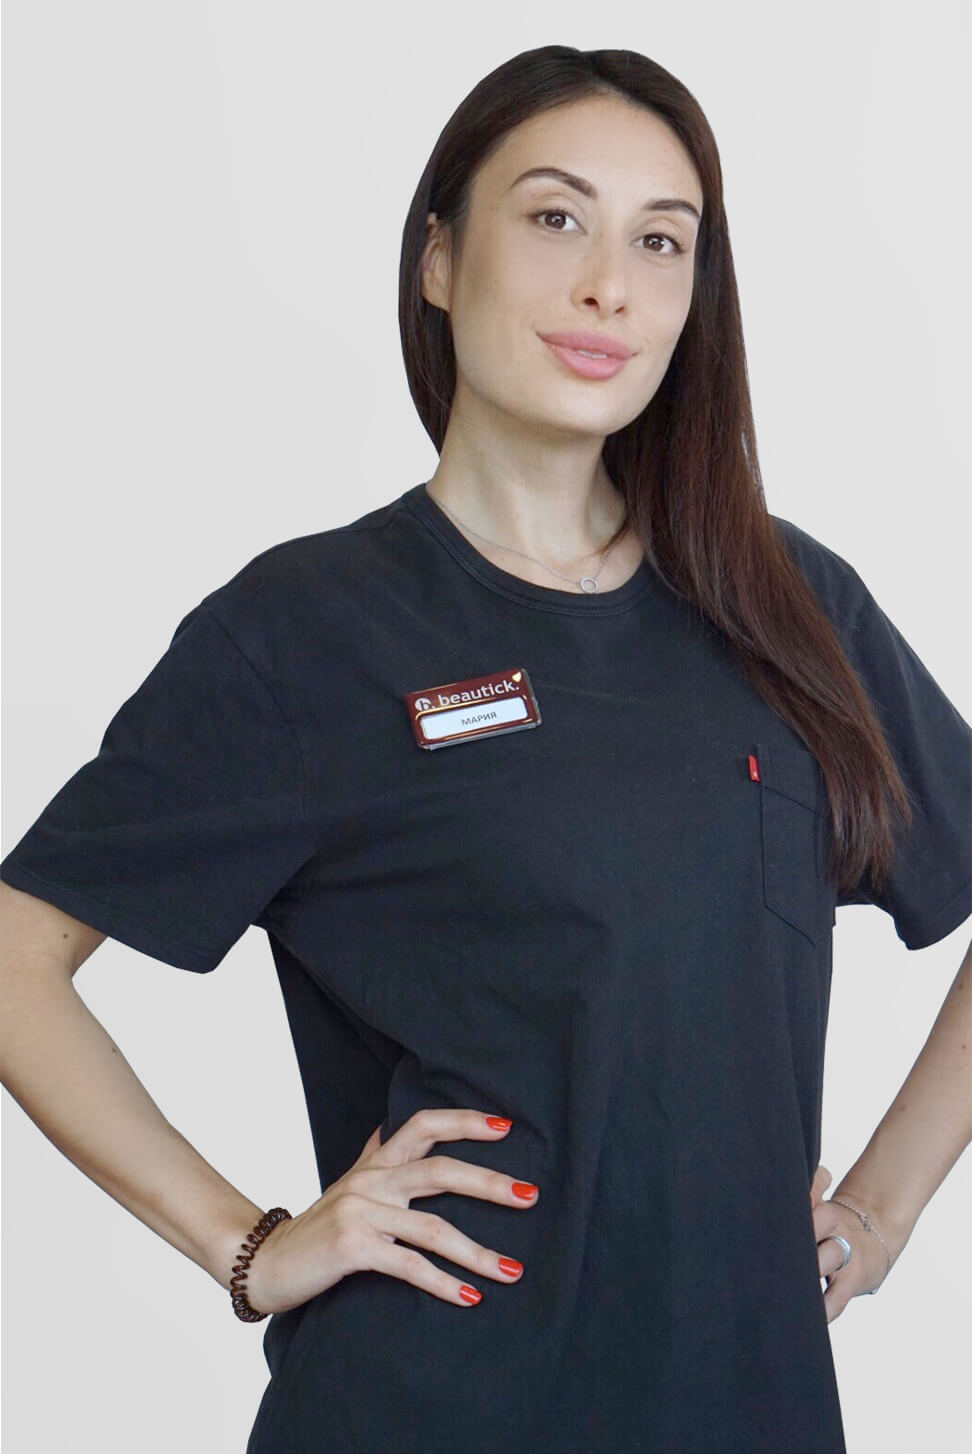 Мария Кручинина